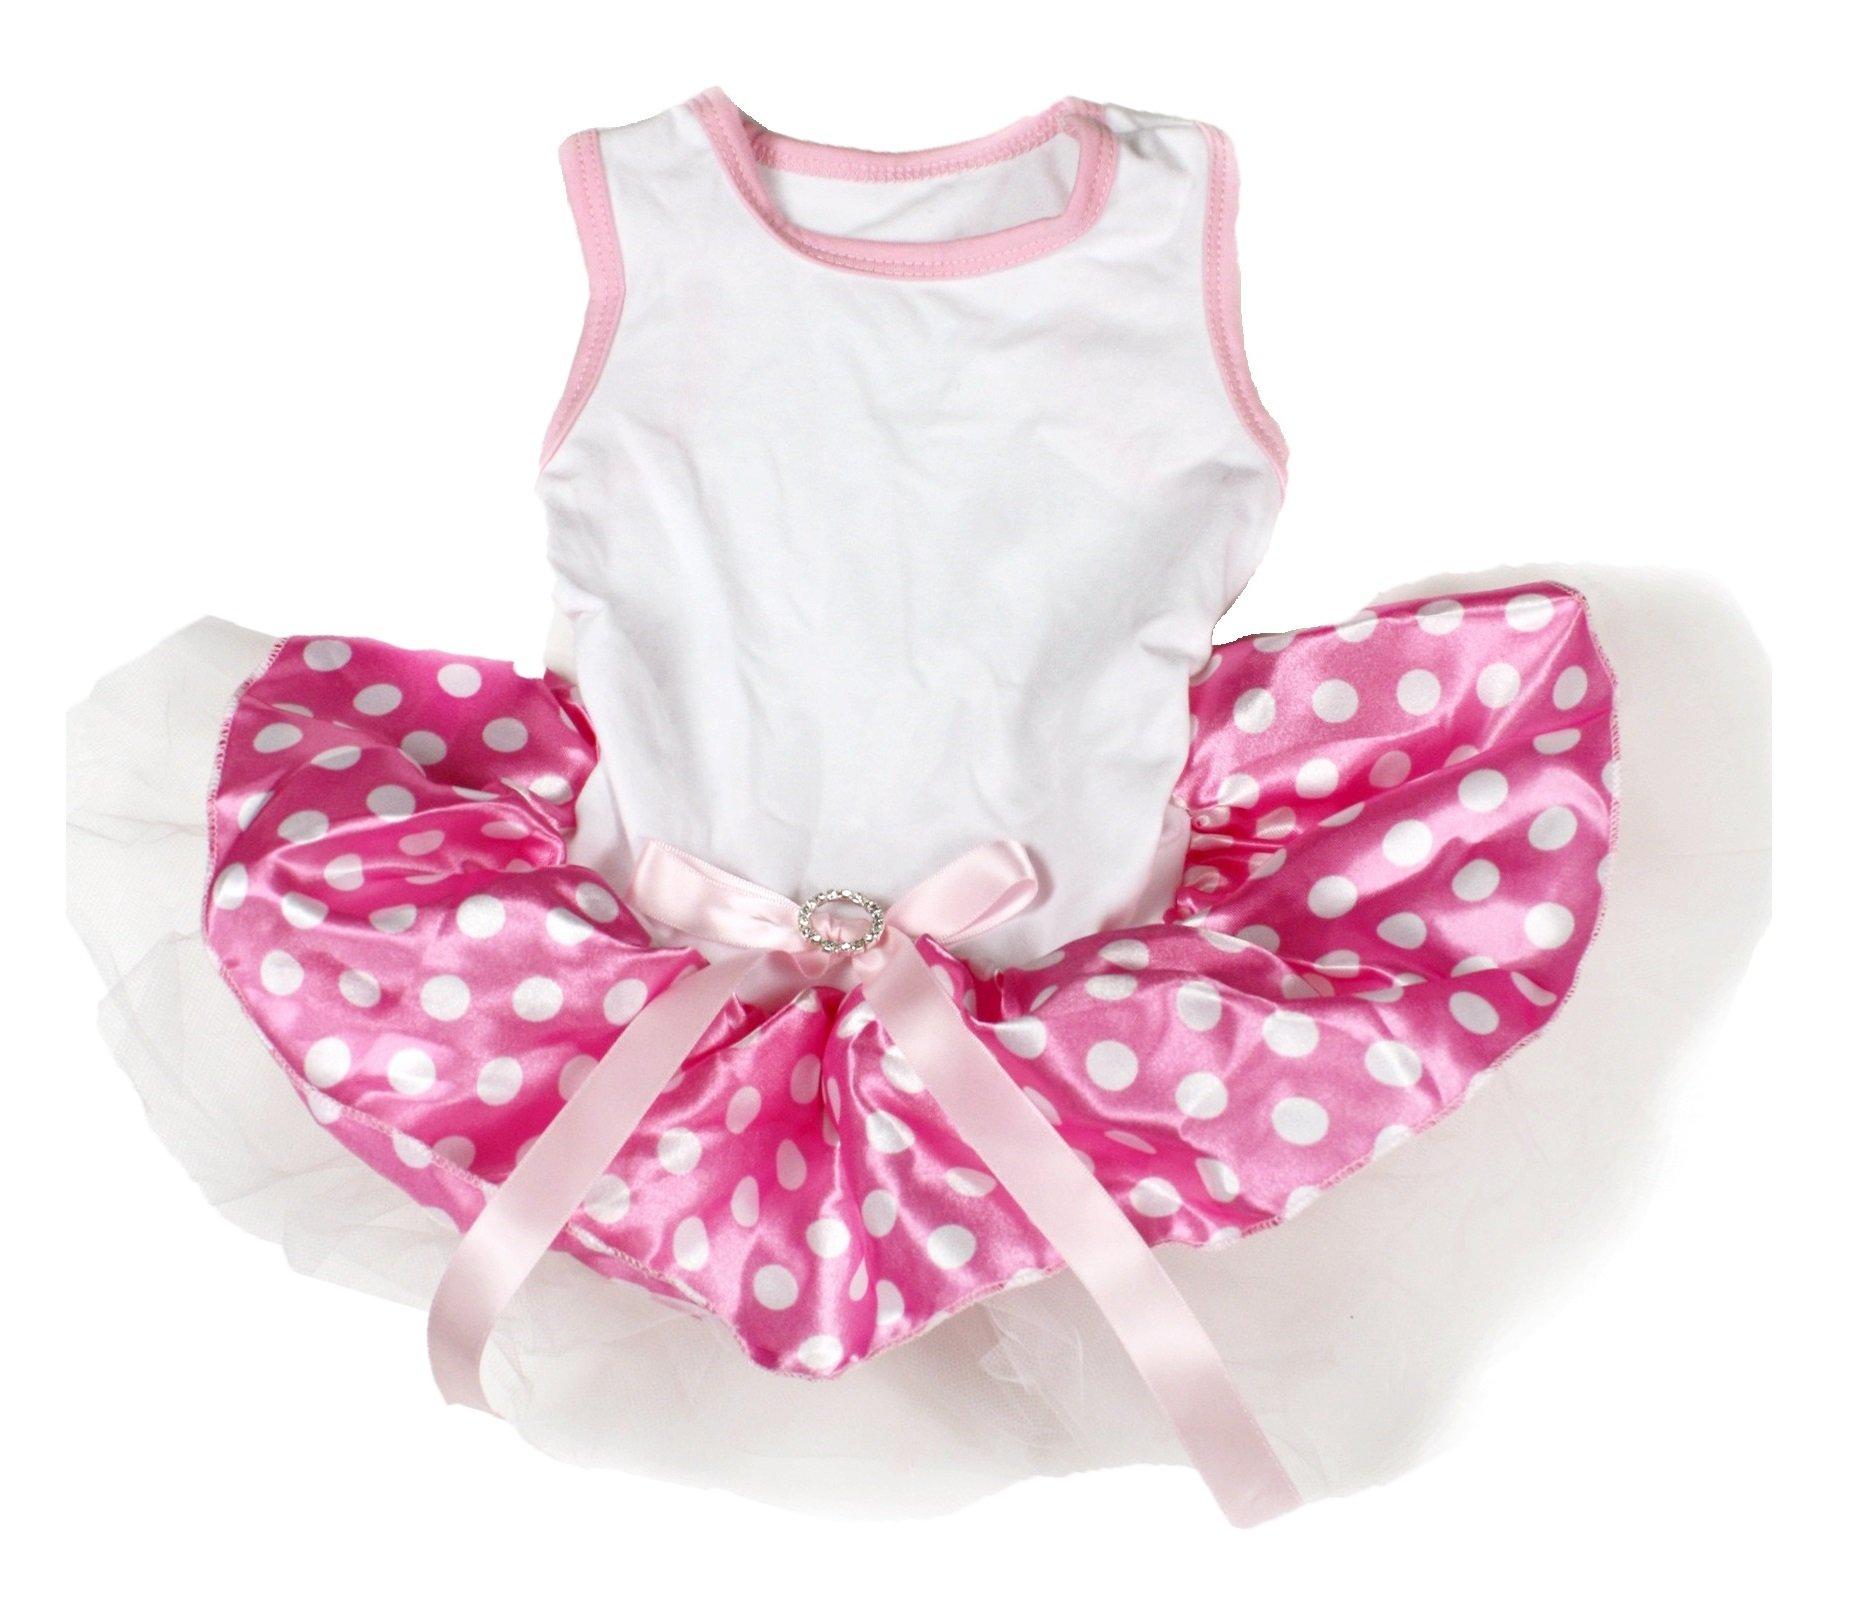 Puppy Clothes Dog Dress White Cotton Top Pink White Polka Dots Tutu Animal Wear (Medium)